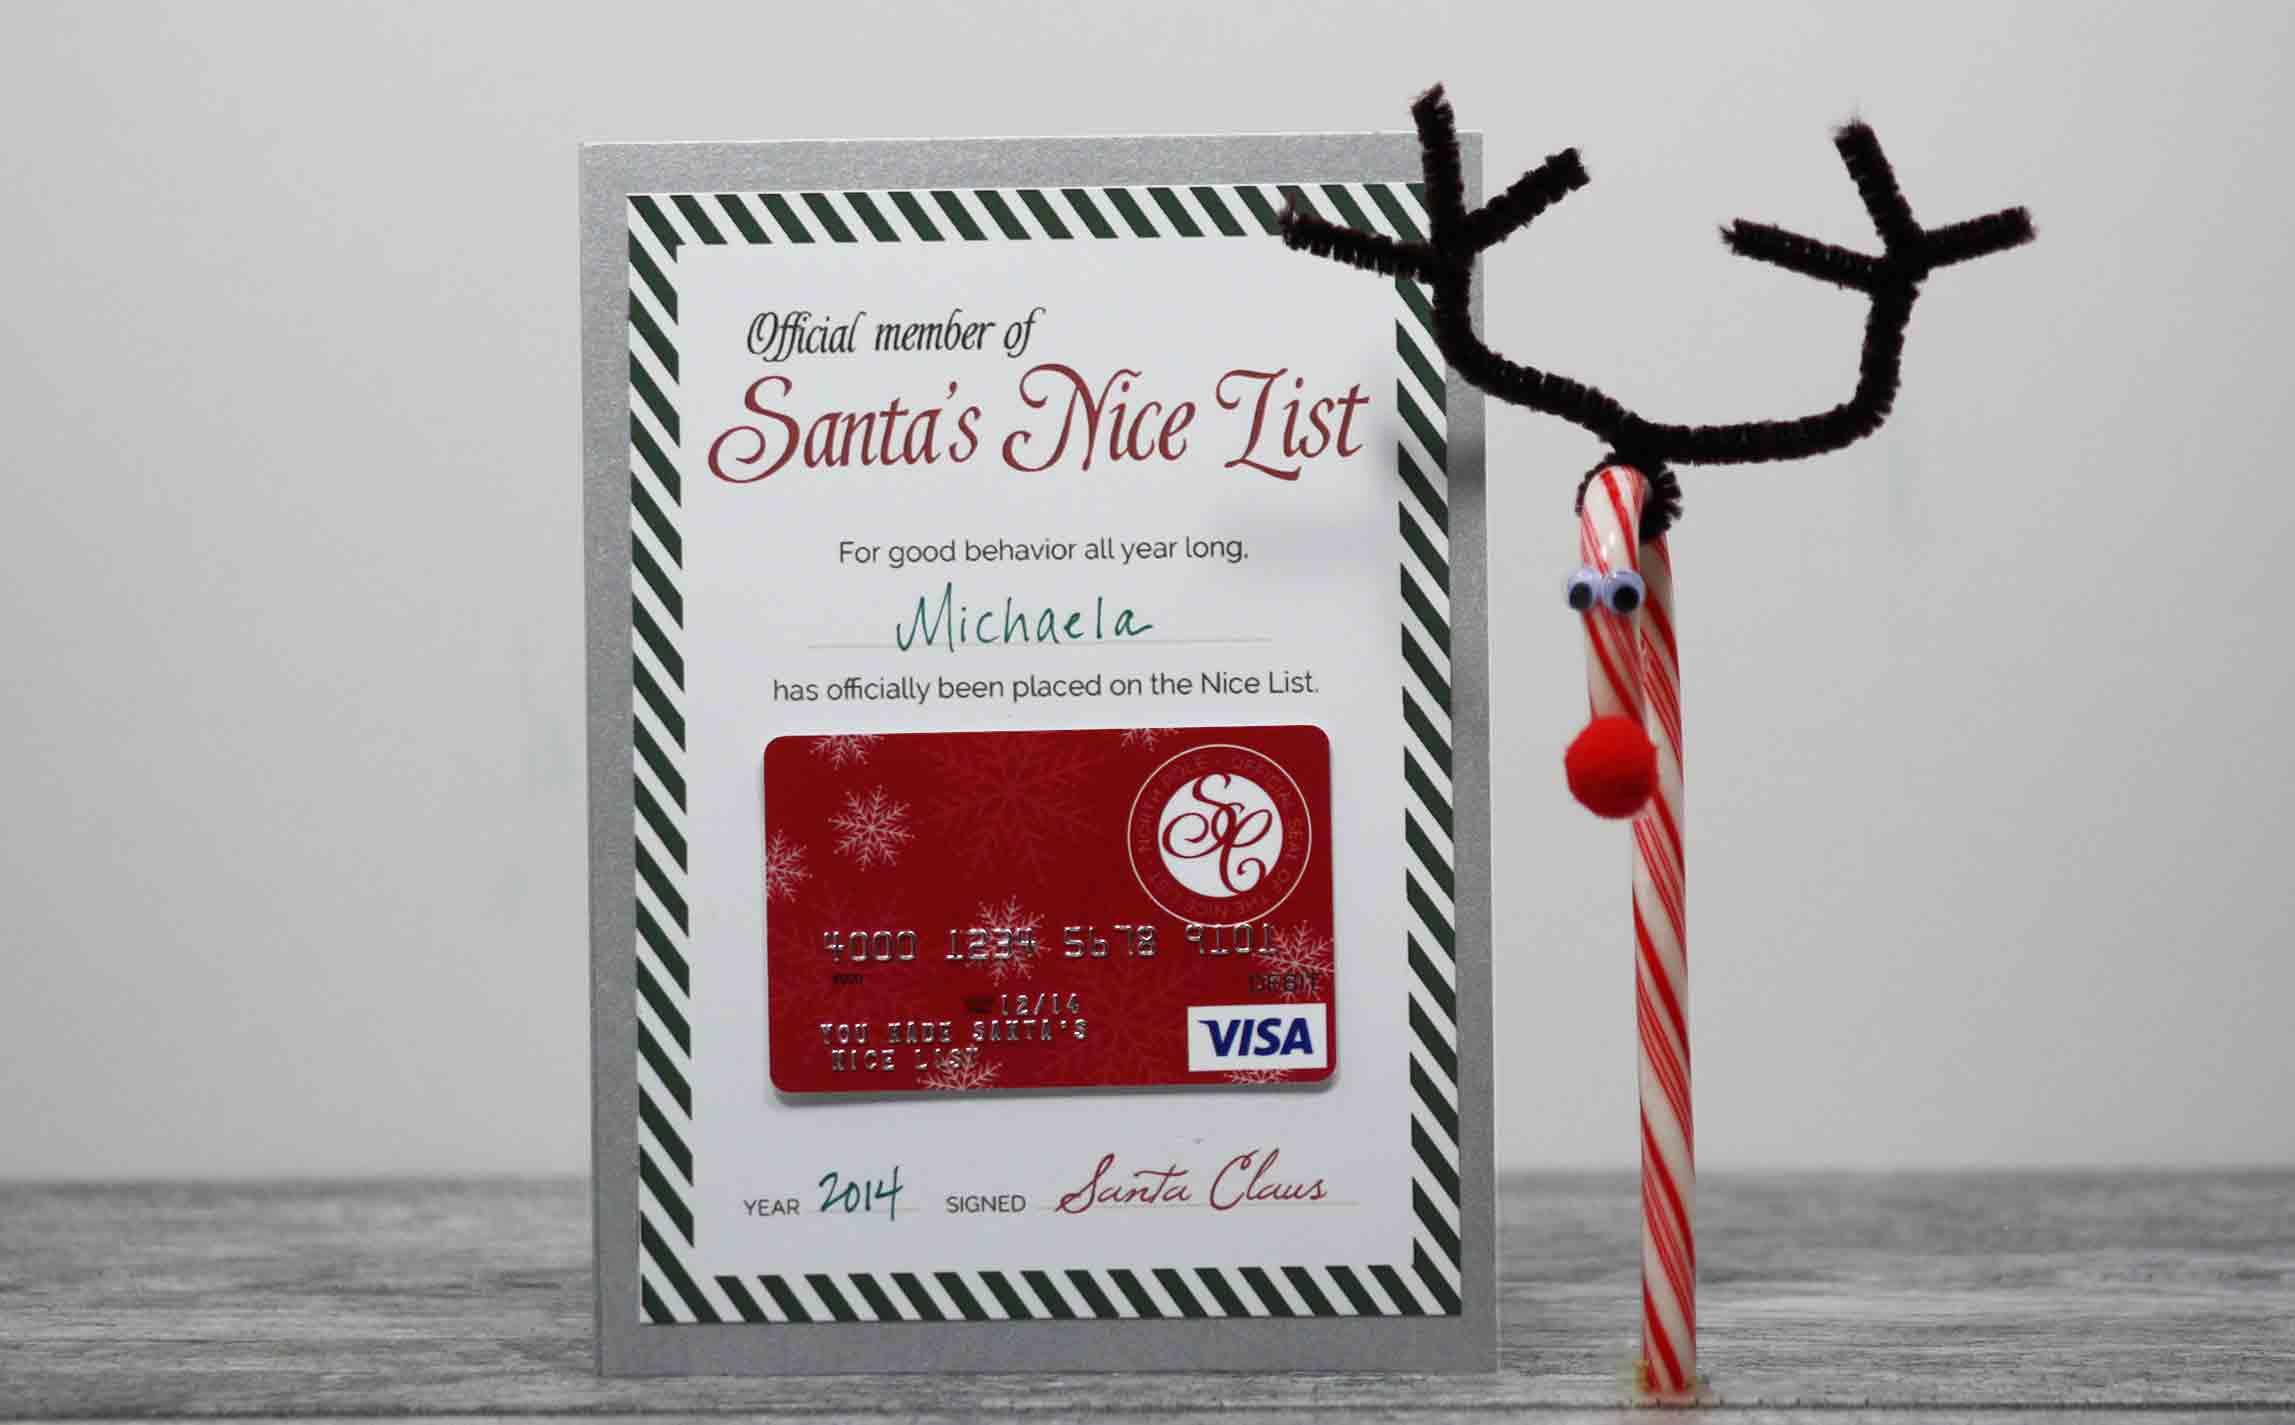 Visa Gift Card Clipart.